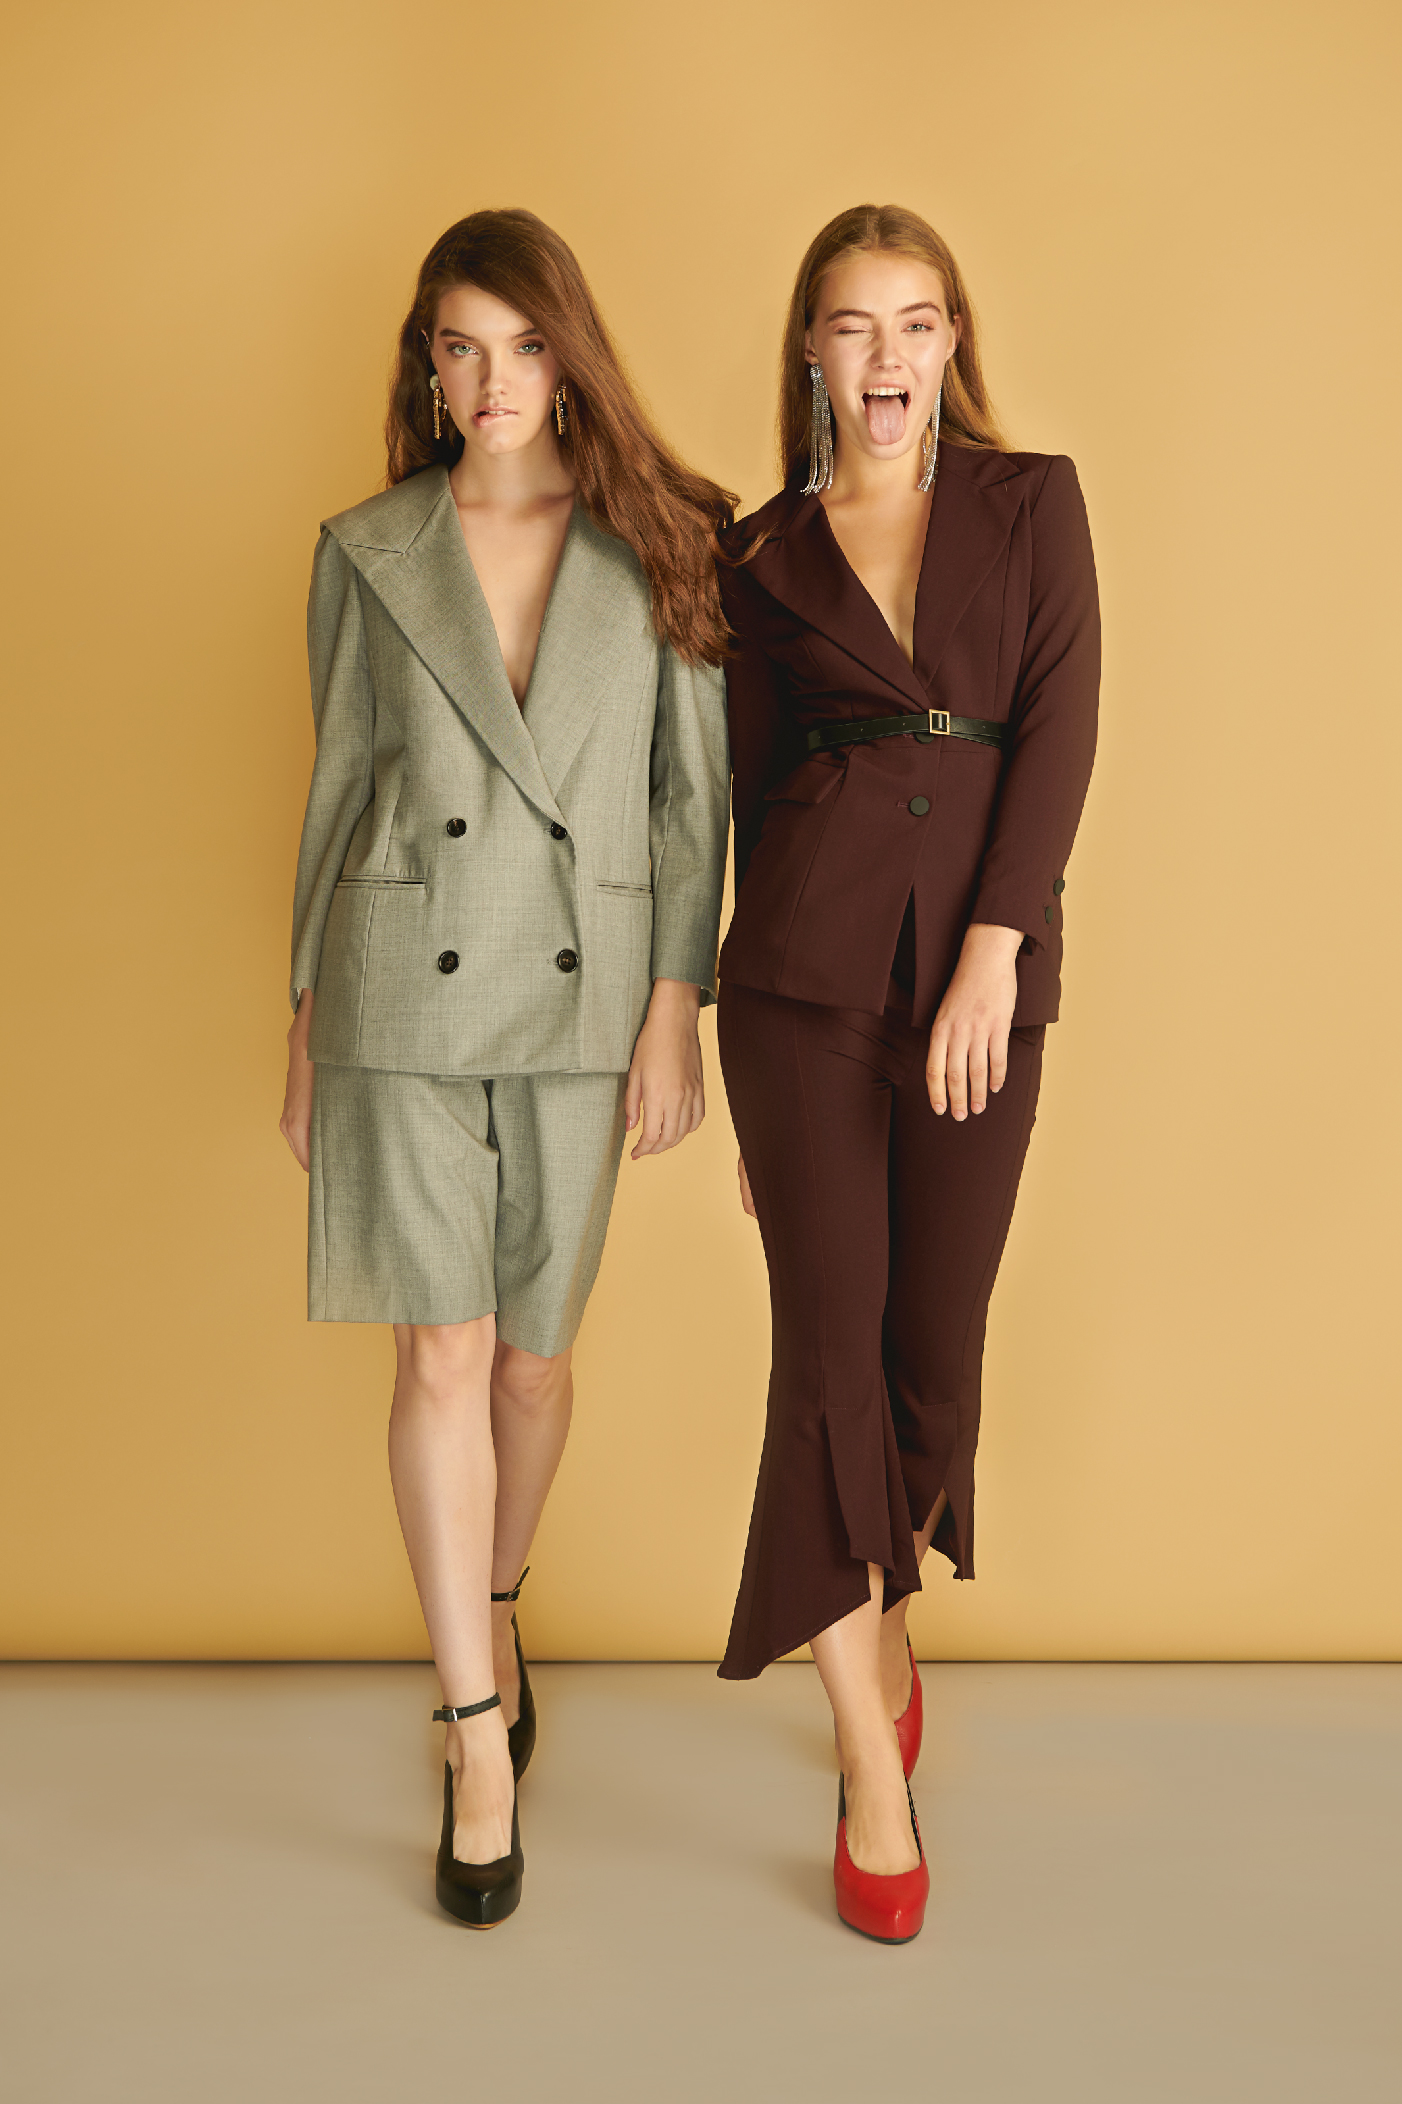 https://s3-ap-southeast-1.amazonaws.com/bchurunway/lookbook/fashion-bold/lookbook_fashion+Bold_edit+photo-04.jpg